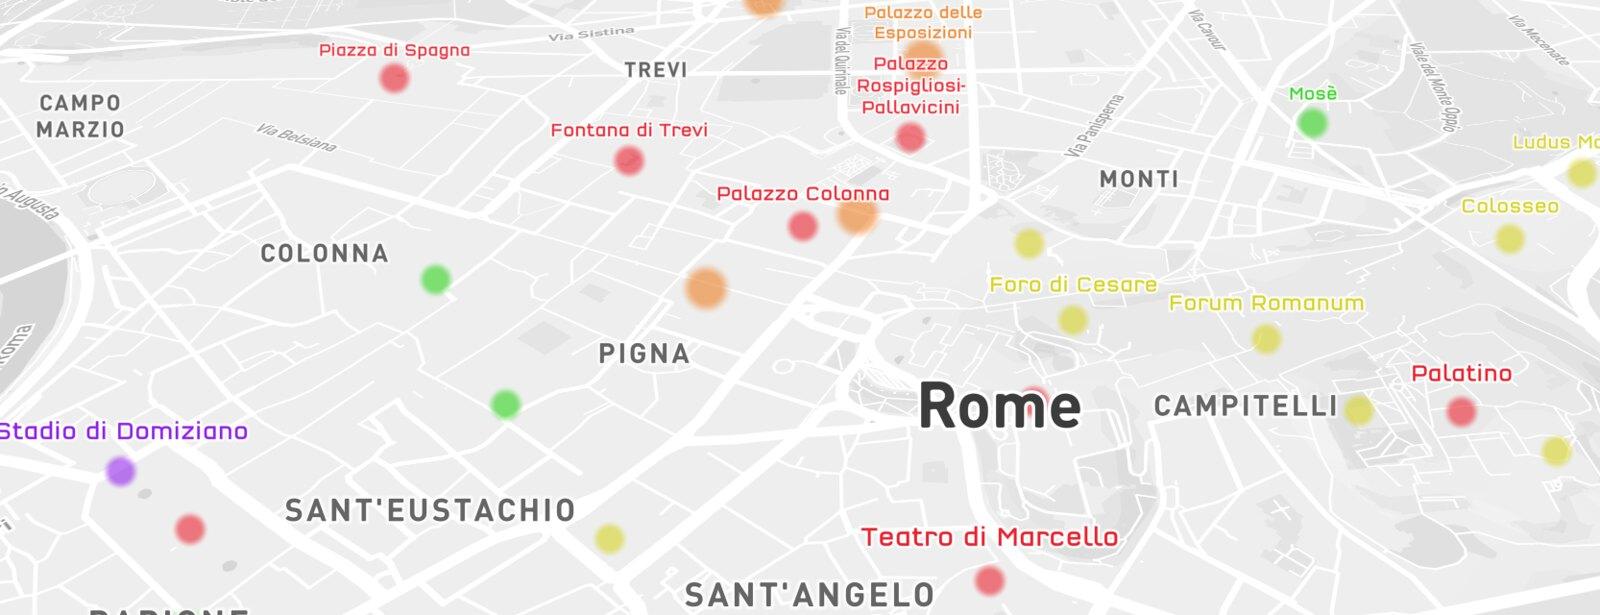 Mapbox Streets landmarks in Rome